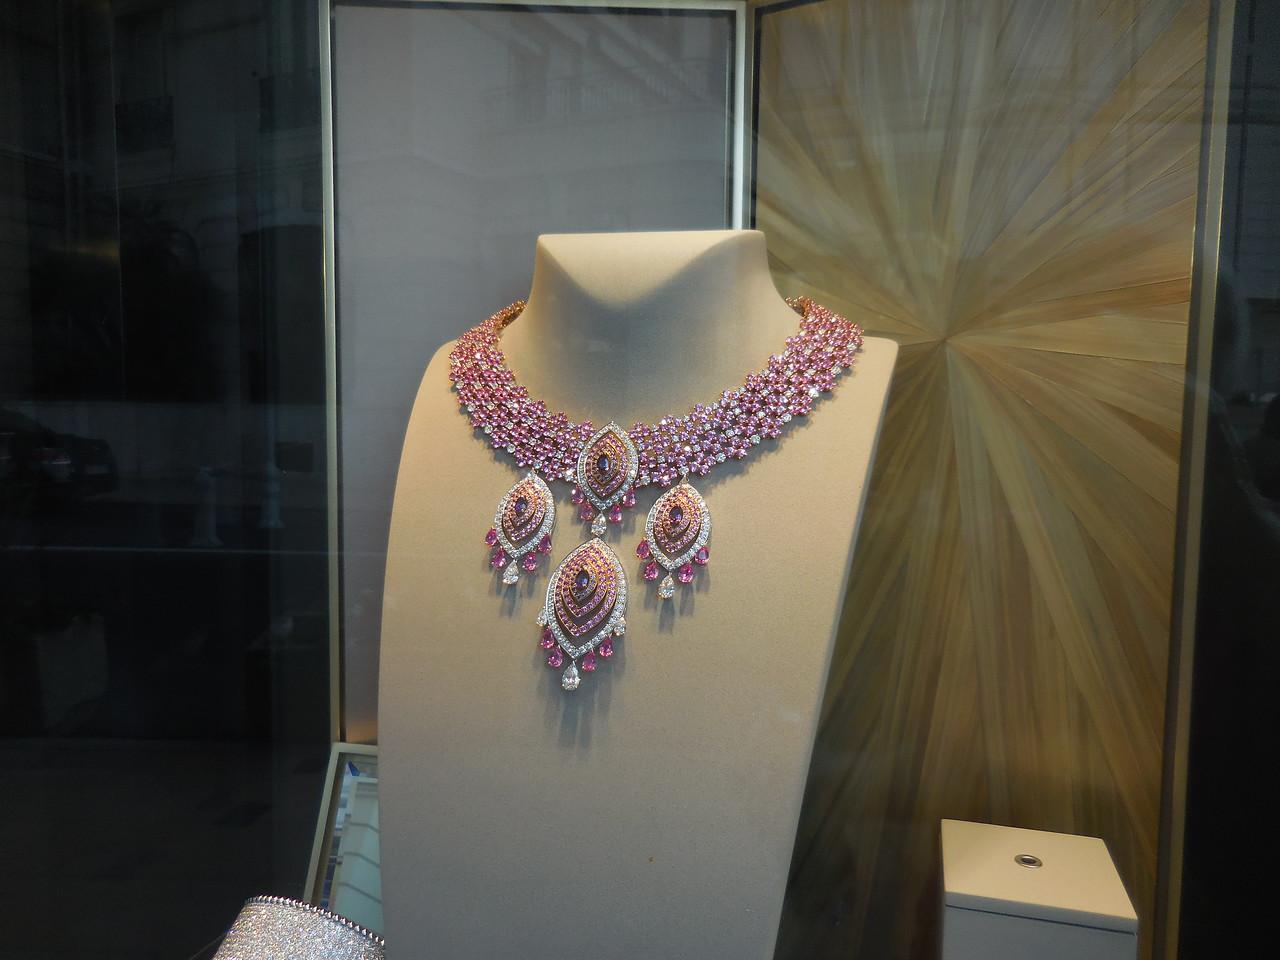 Spectacular necklace near casino